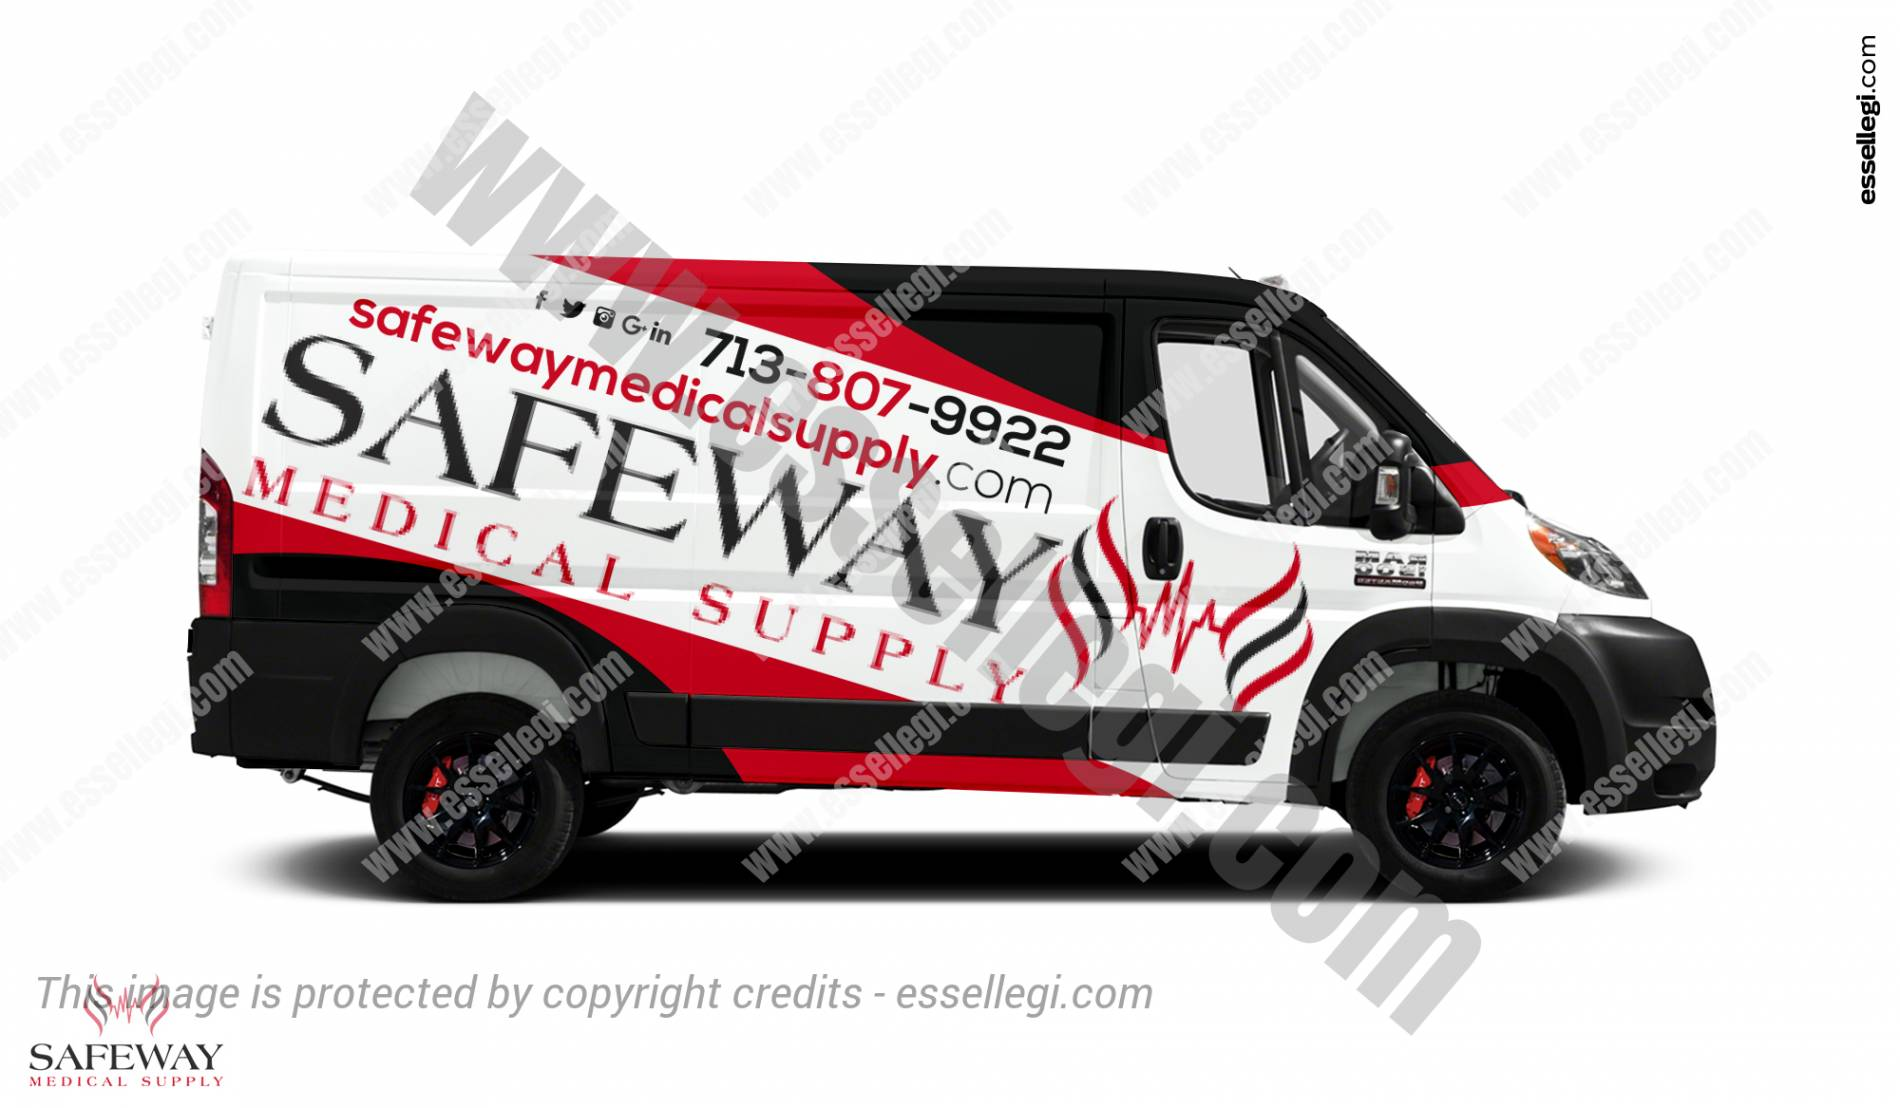 Dodge Ram ProMaster 1500 | Van Wrap Design by Essellegi.Van Signs, Van Signage, Van Wrapping, Van Signwriting, Van Wrap Designer, Signs for Van, Van Logo by Essellegi.